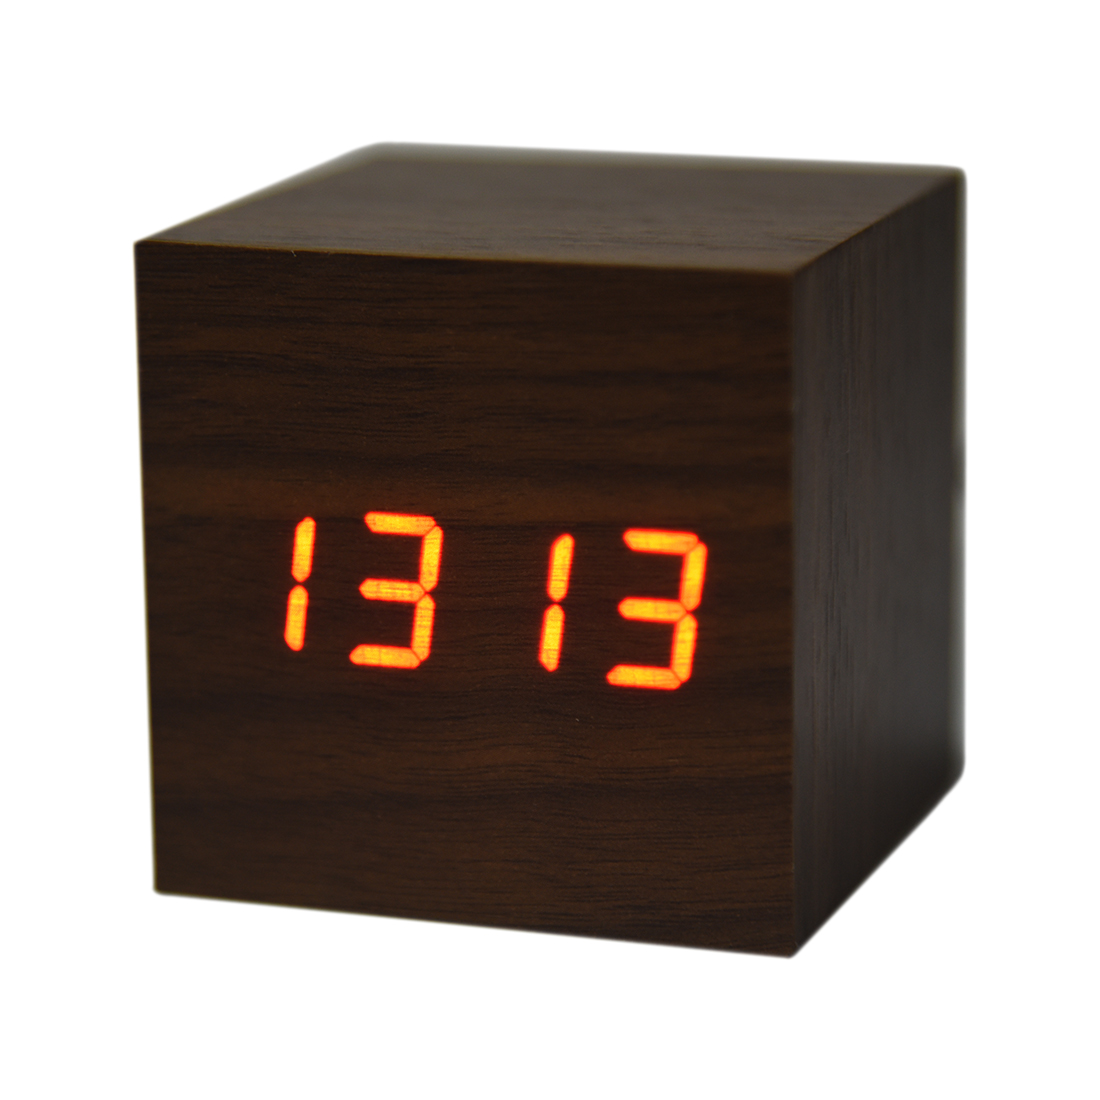 Best 3 X Aaa Usb Ed Mini Wooden Clock Led Digital Desktop Alarm Brown In Clocks From Home Garden On Aliexpress Alibaba Group